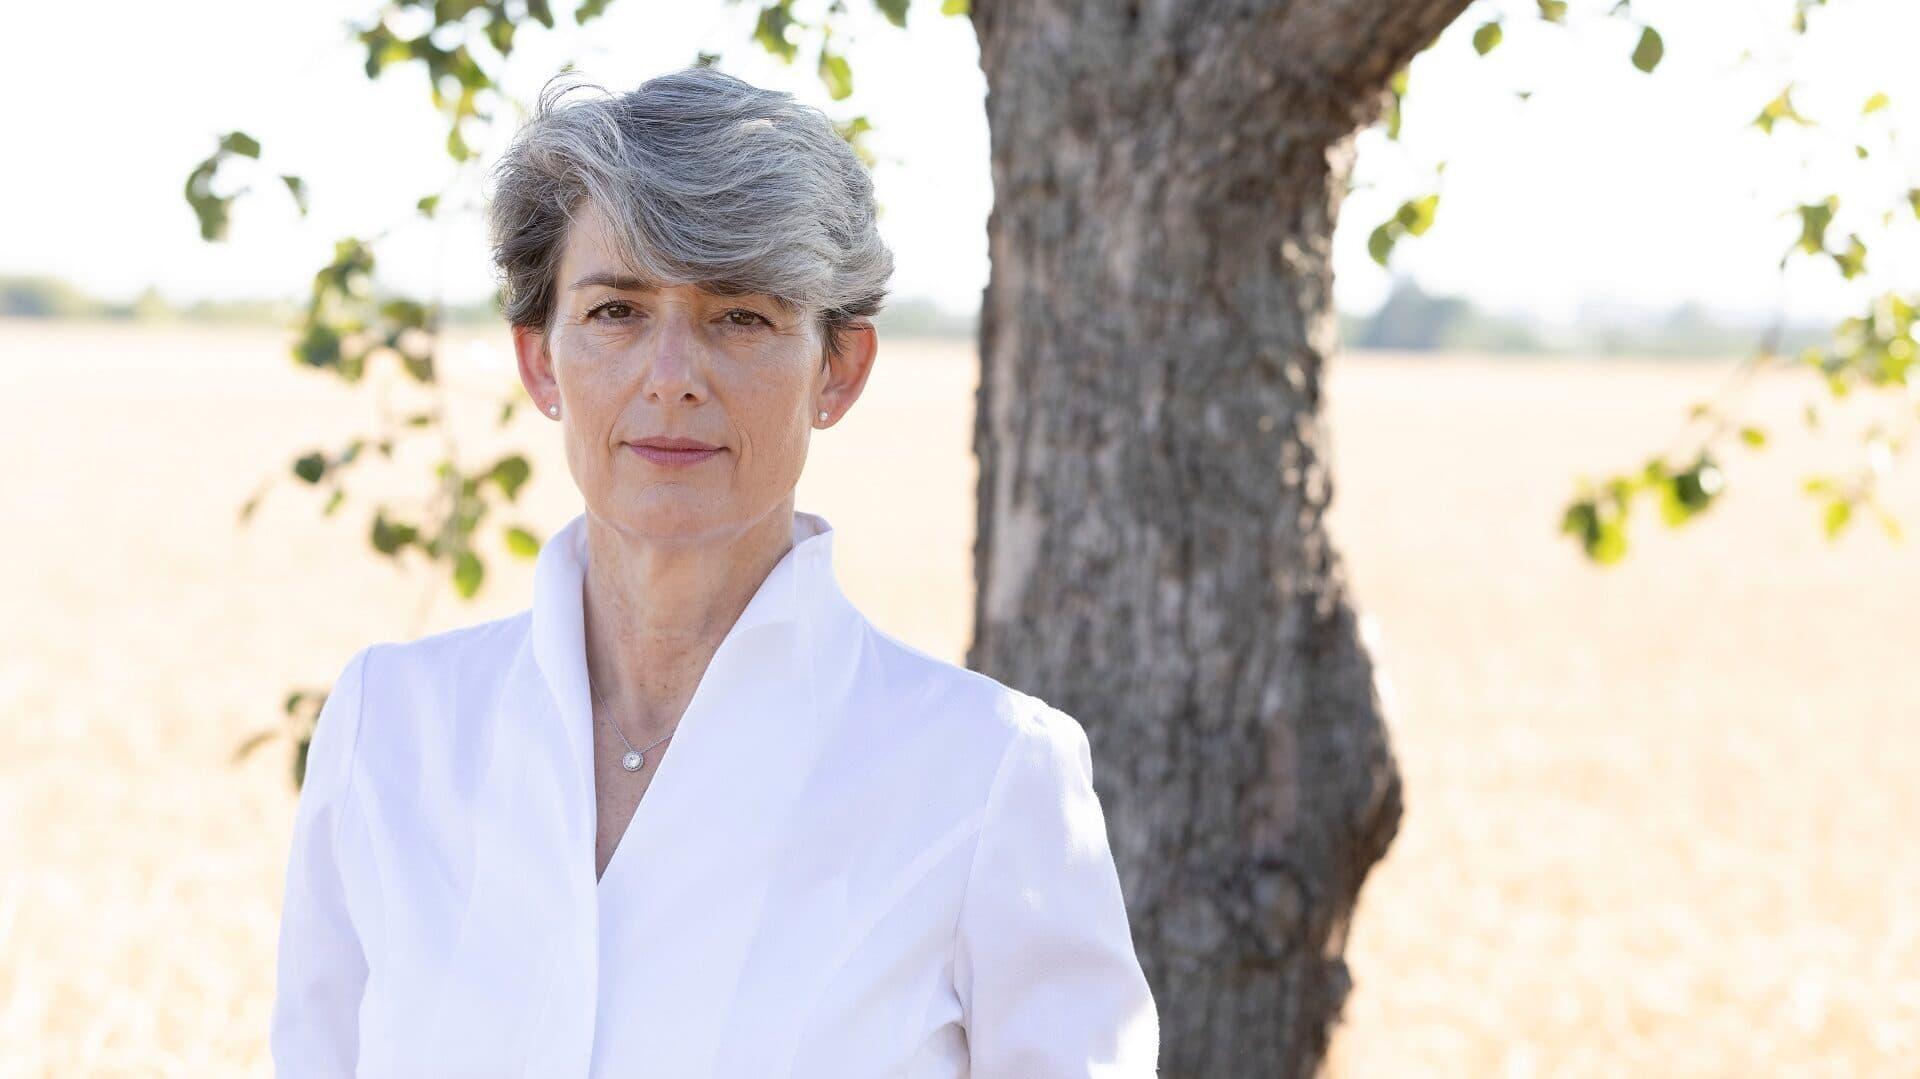 Judith Faller-Moog, Ölmühle Moog, Bio Planete